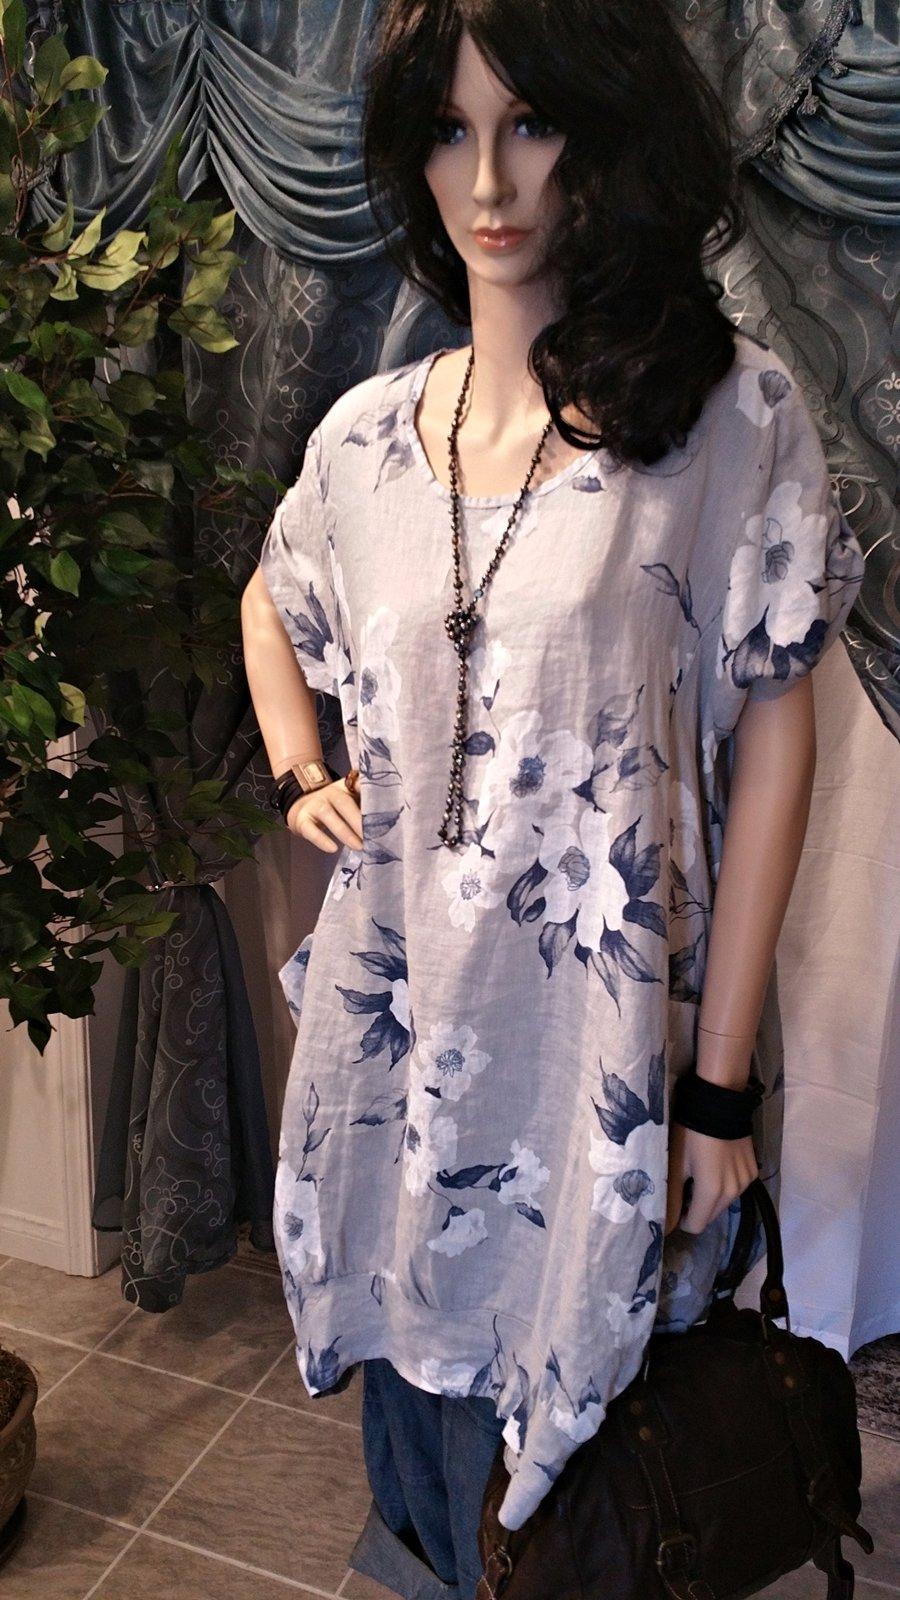 Gray & Blue Floral Linen Lagenlook One Size/Plus Size Tunic Dress - Boho Style, https://kollekcio.com